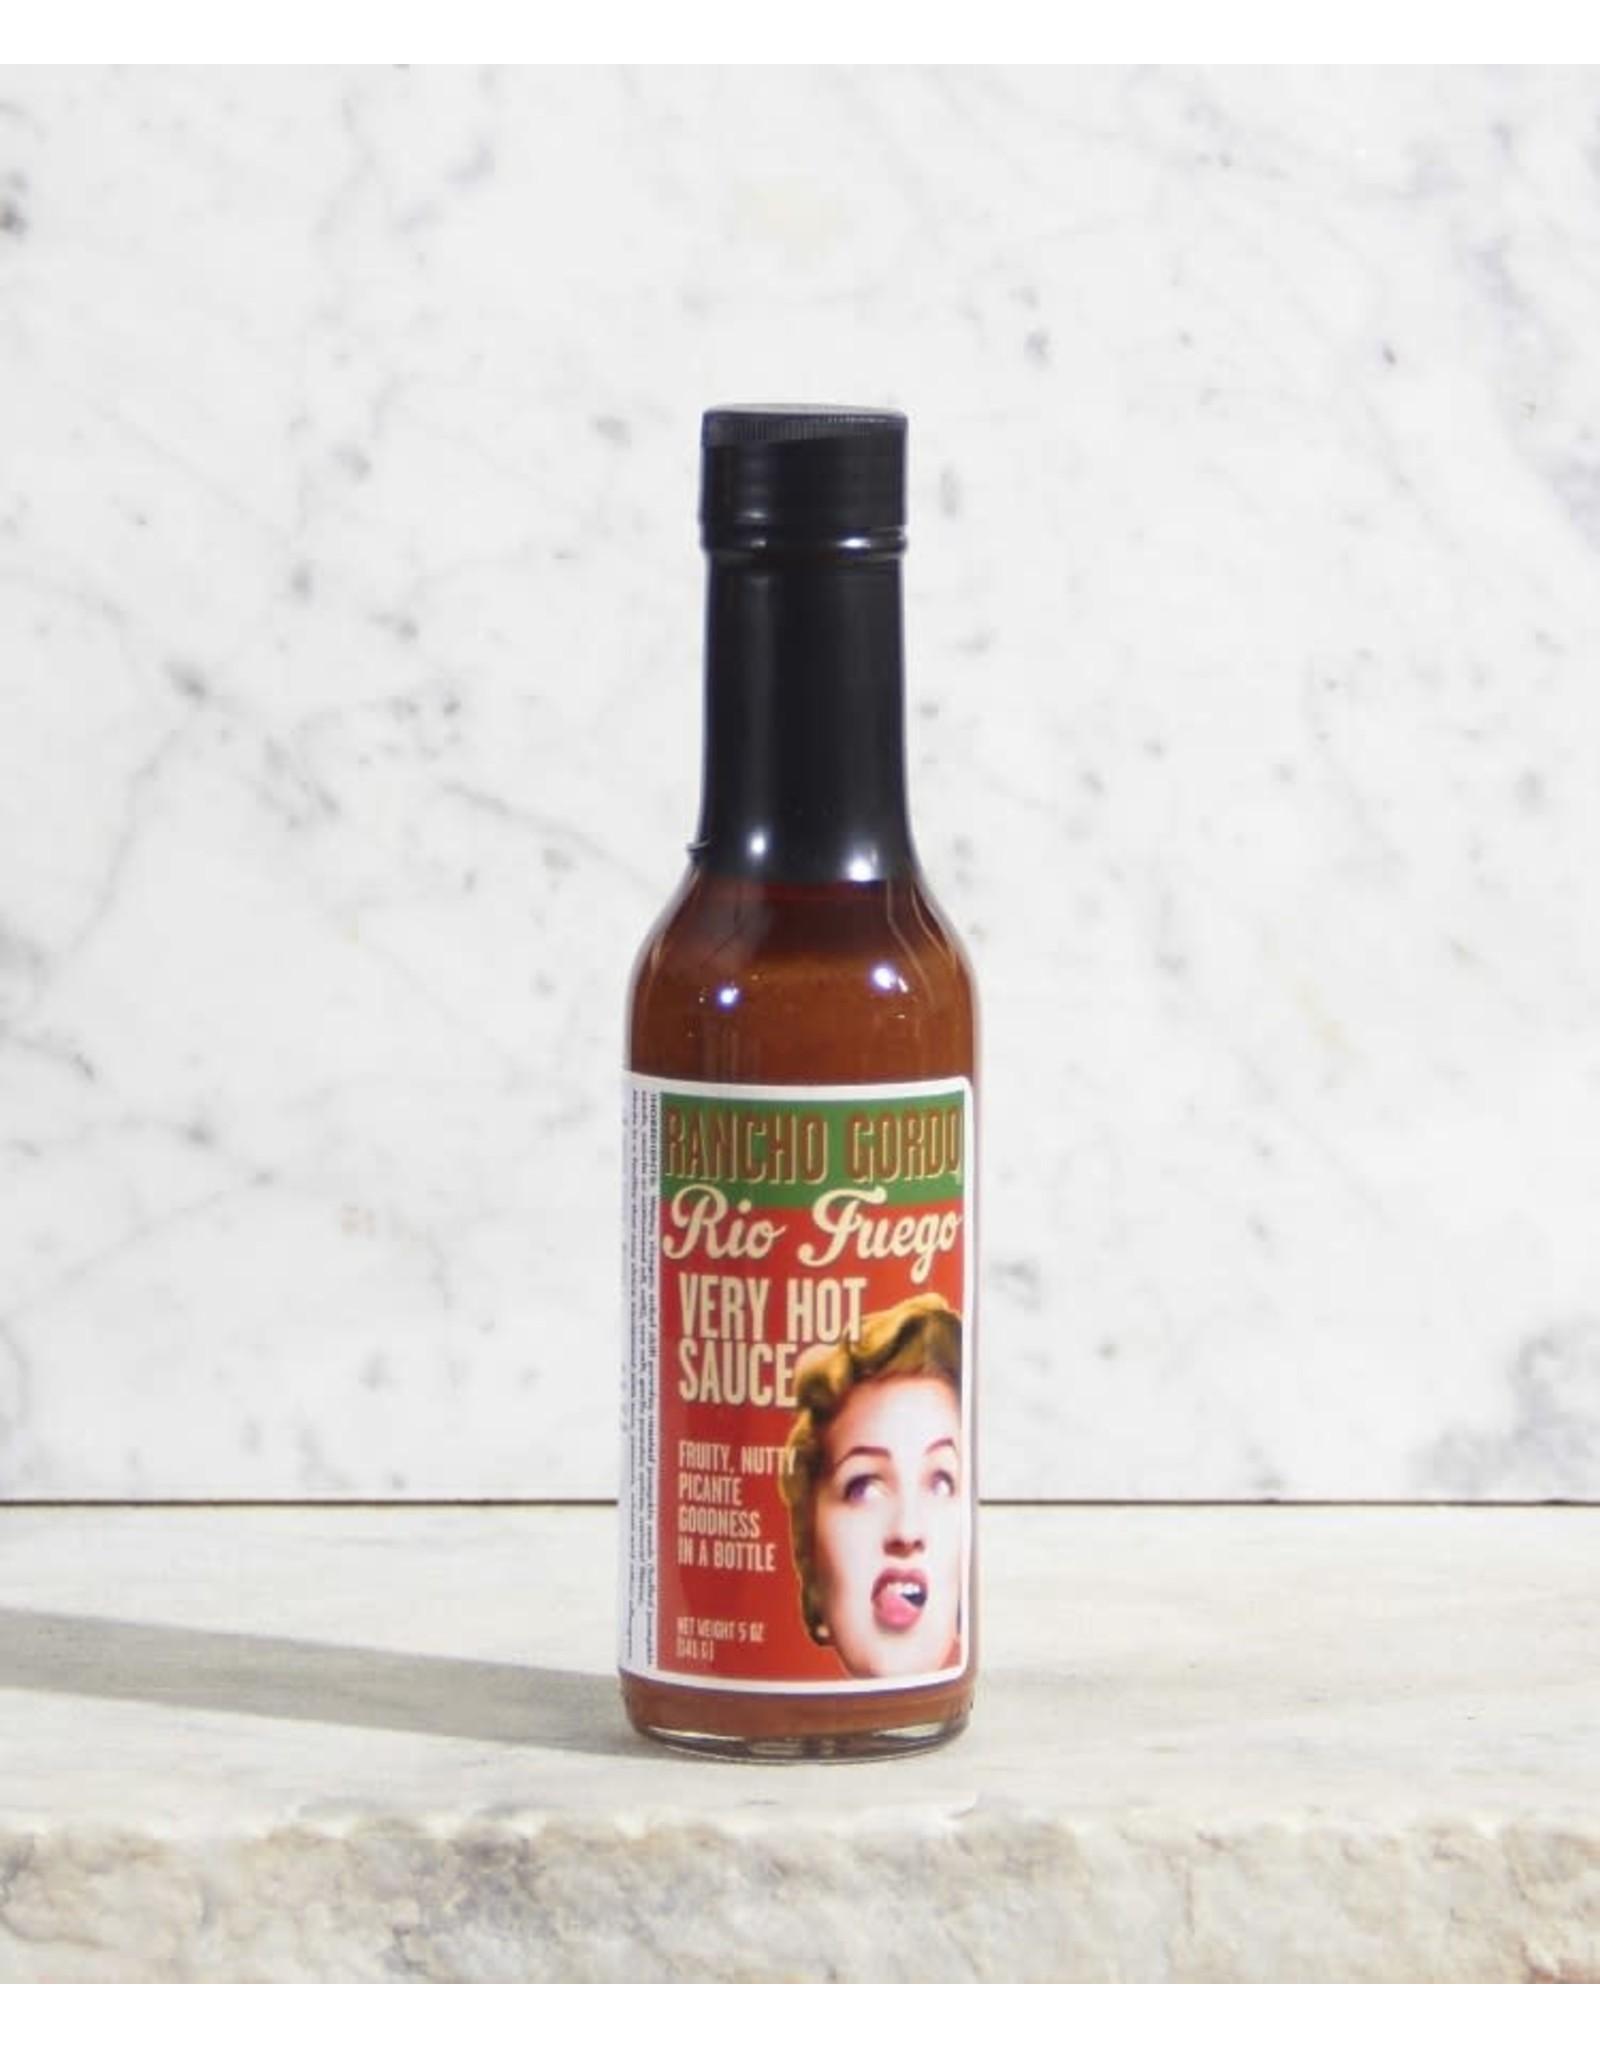 Rio Fuego Very Hot Sauce